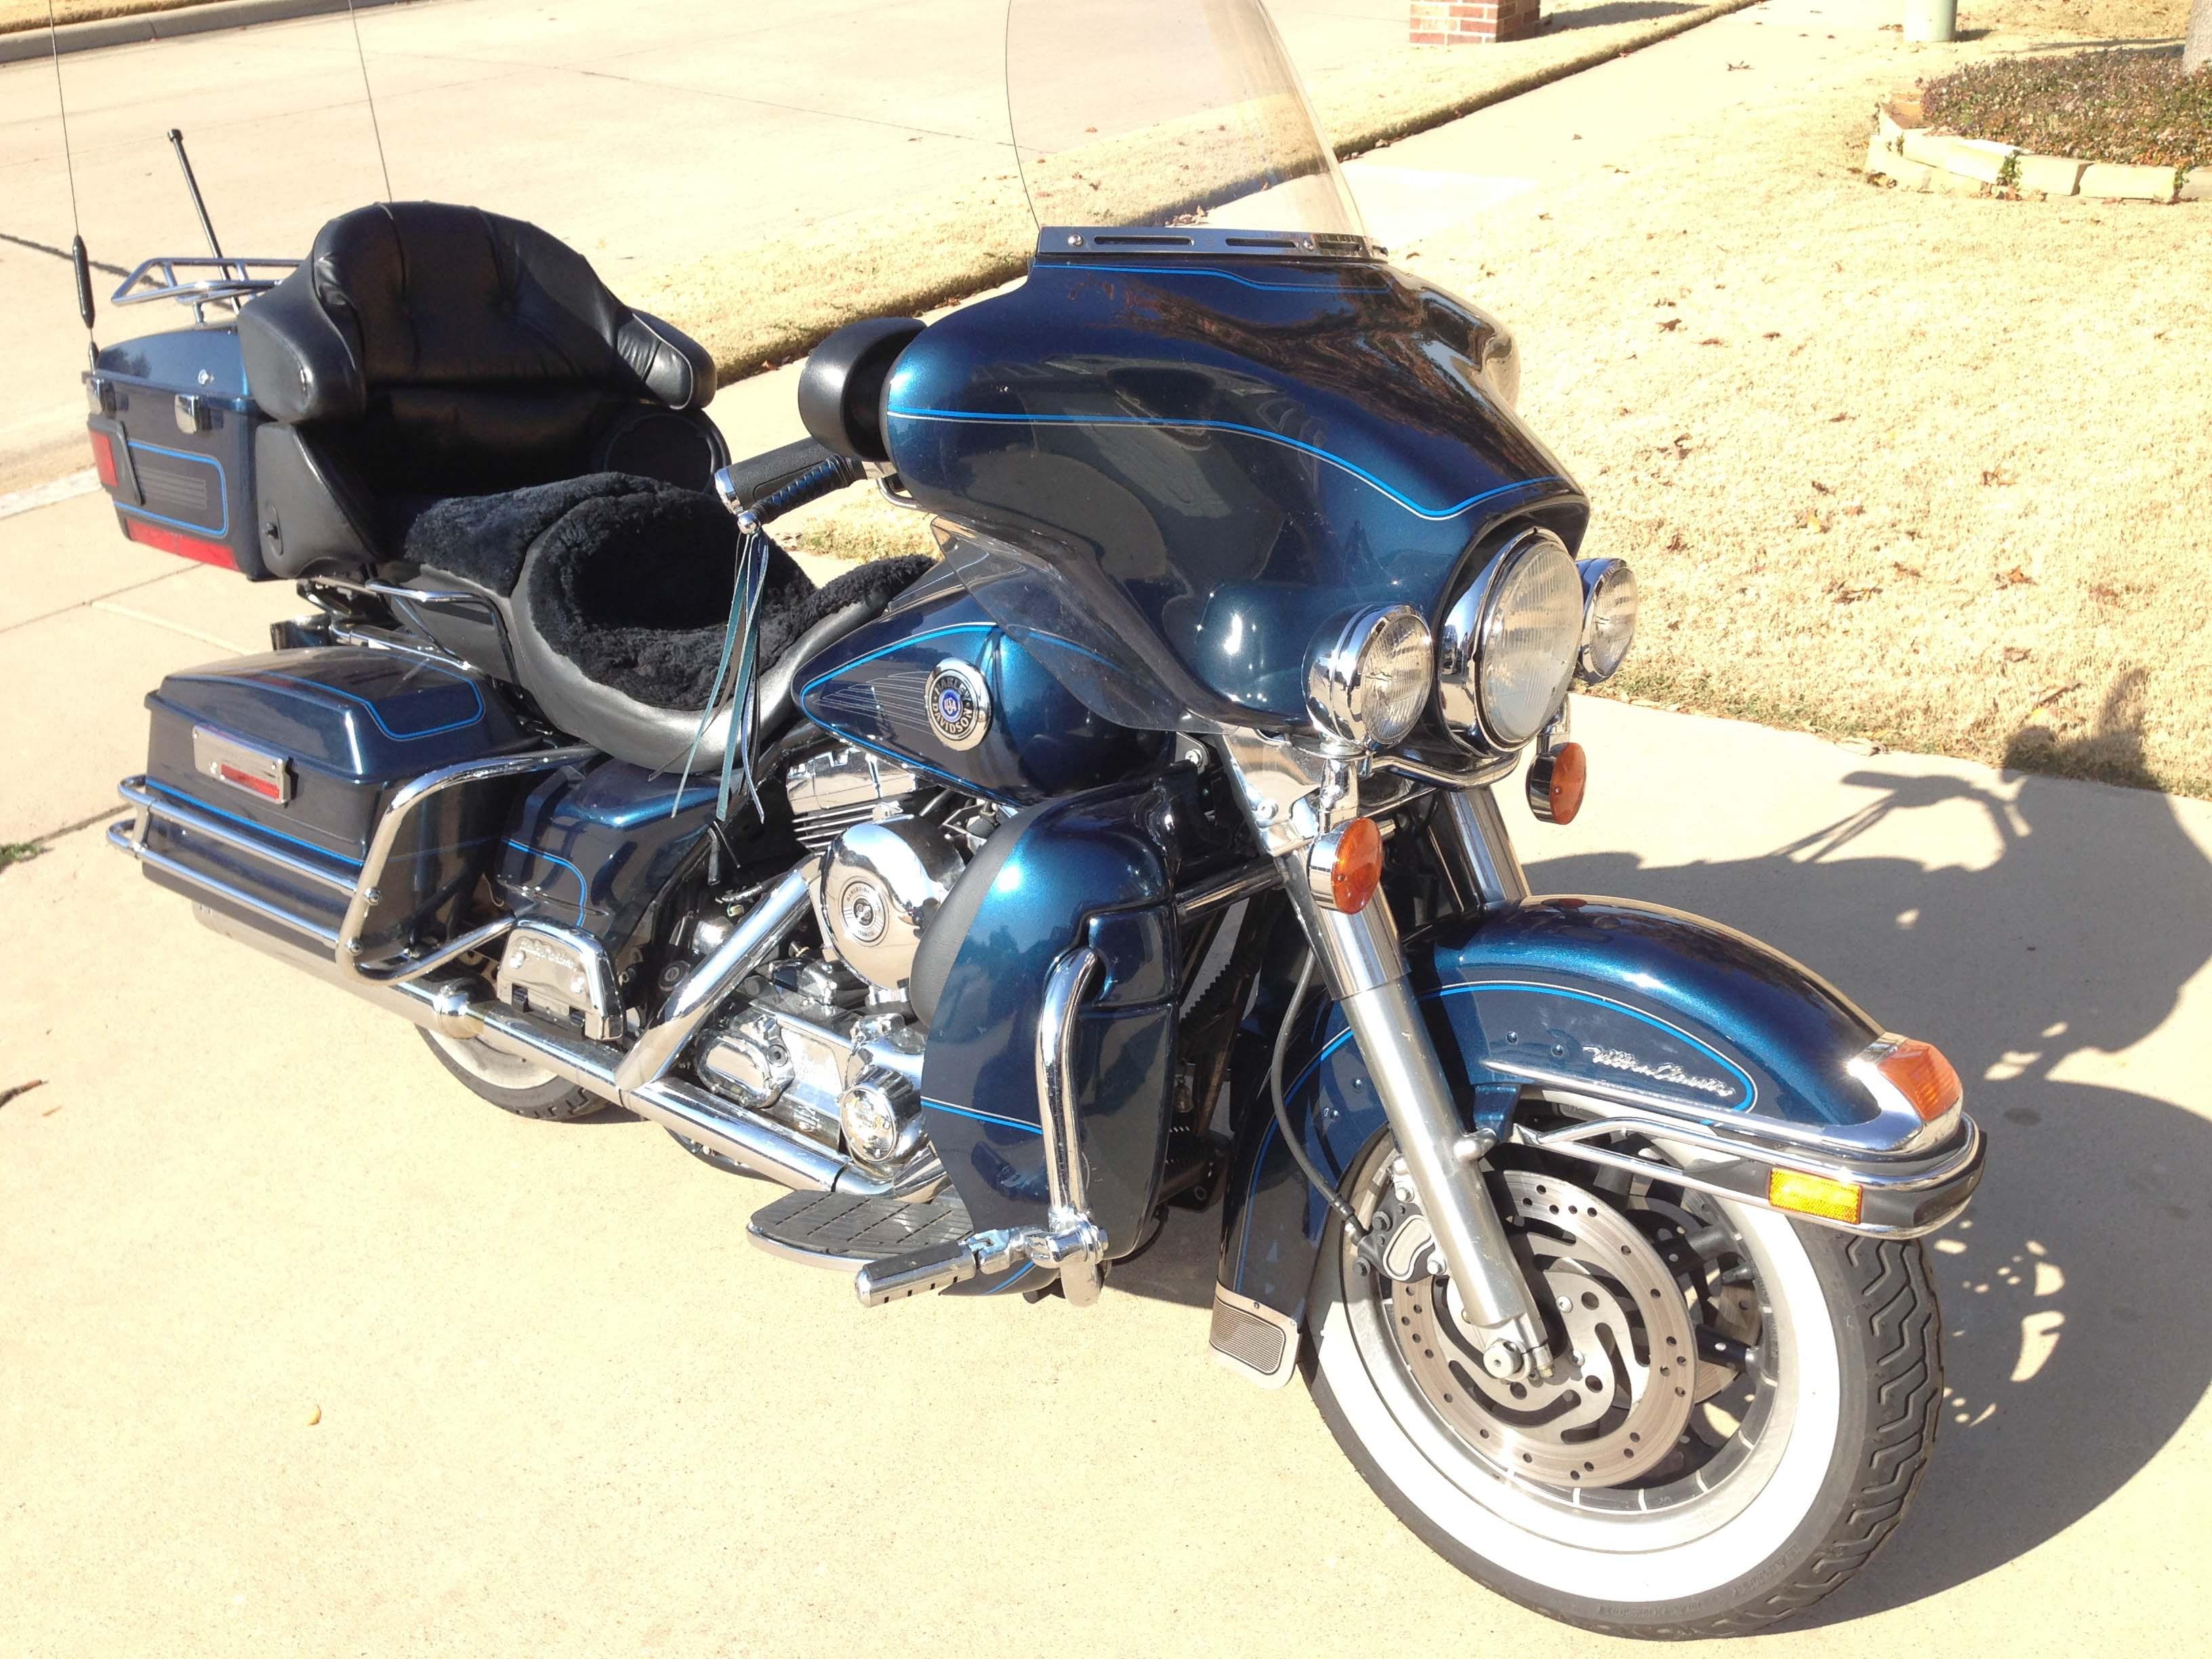 2001 Harley Davidson 174 Flhtc I Electra Glide 174 Classic Blue